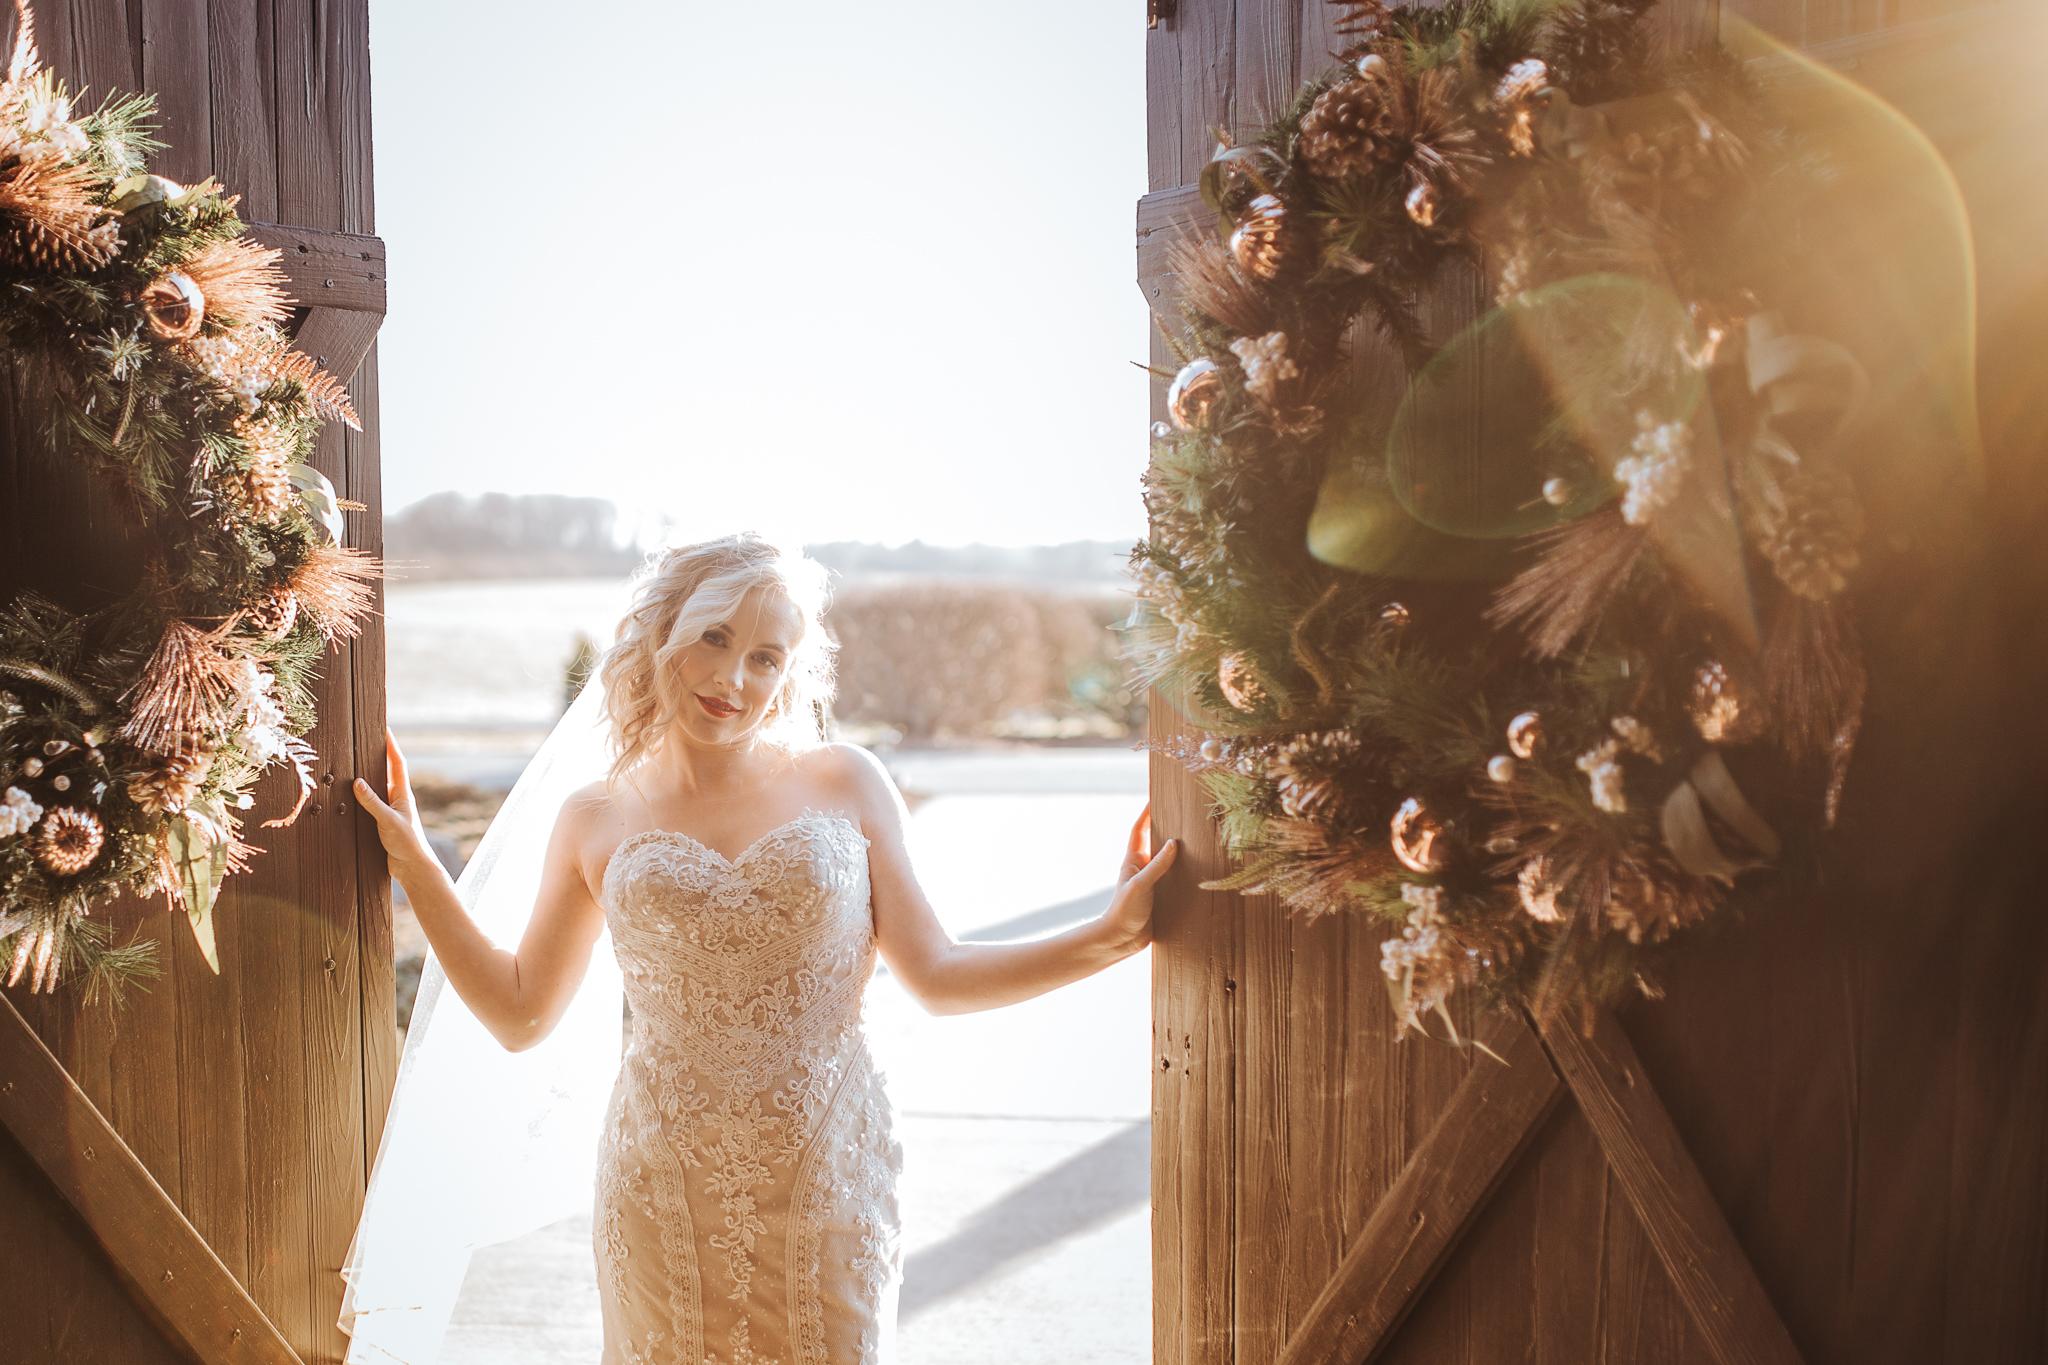 0090 Ariana Jordan Photo - Cameron & Lauren's Wedding at Talon Winery  6476.jpg